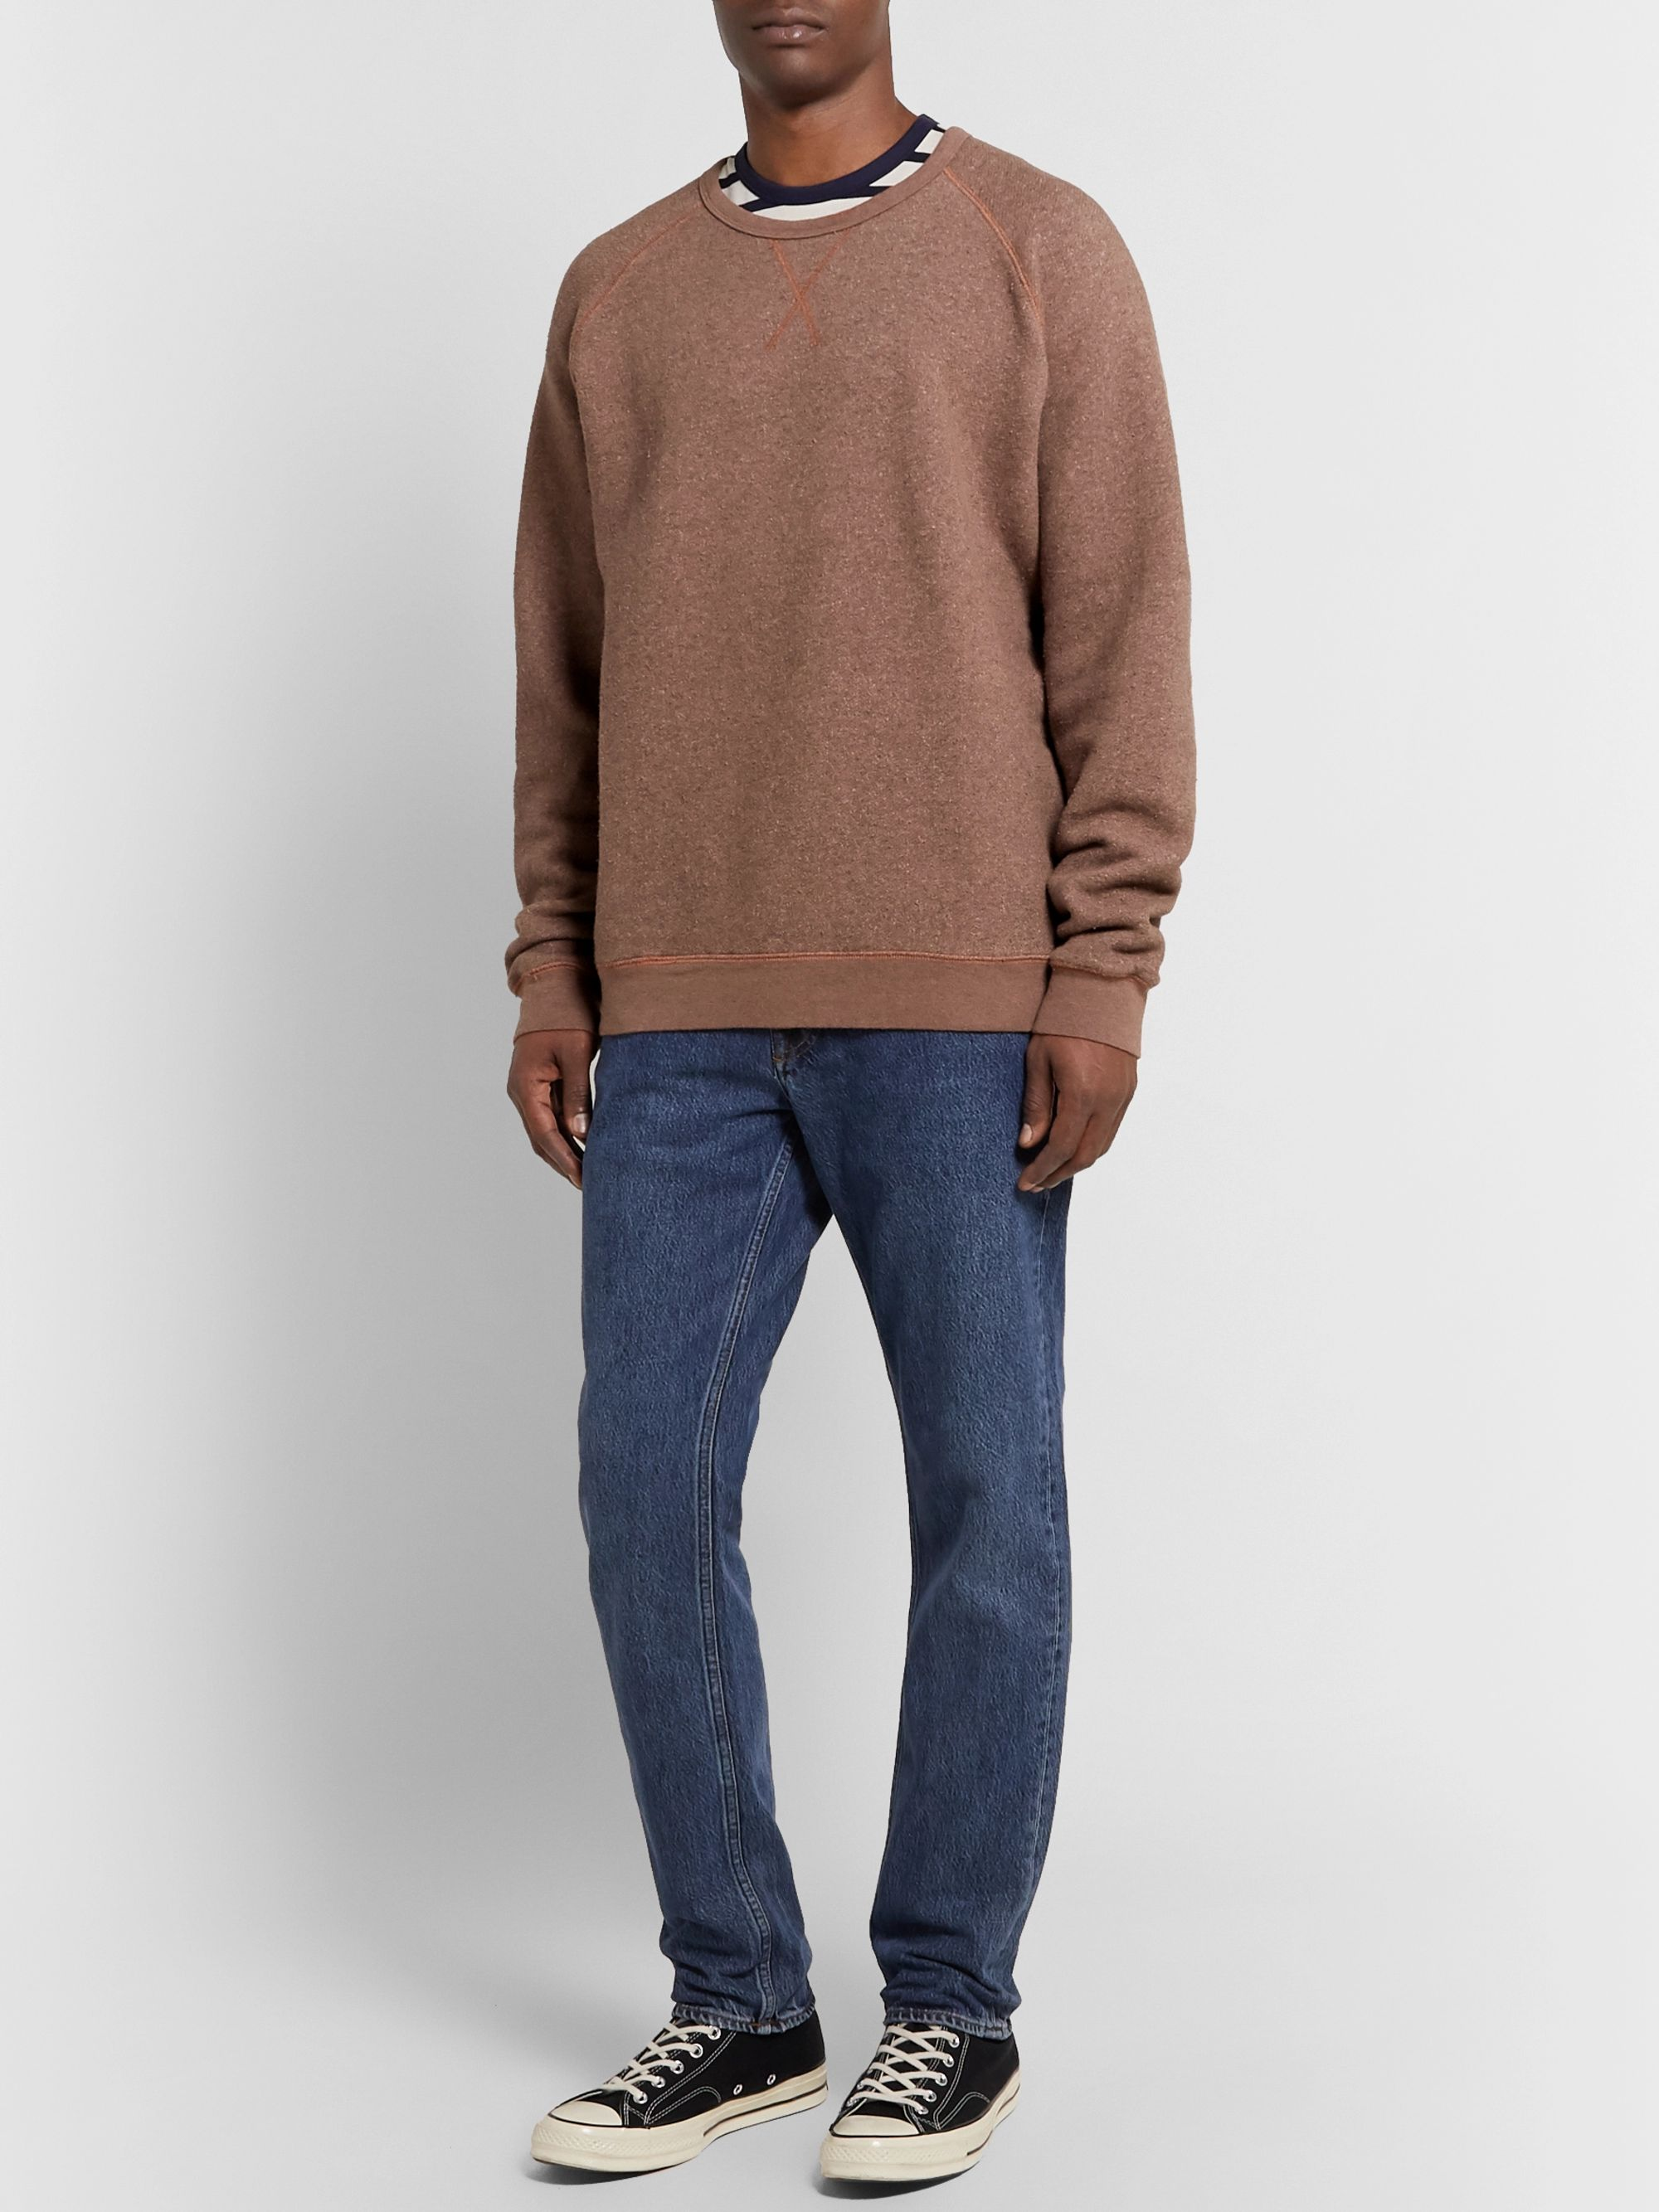 Mélange Fleece Back Cotton Blend Sweatshirt